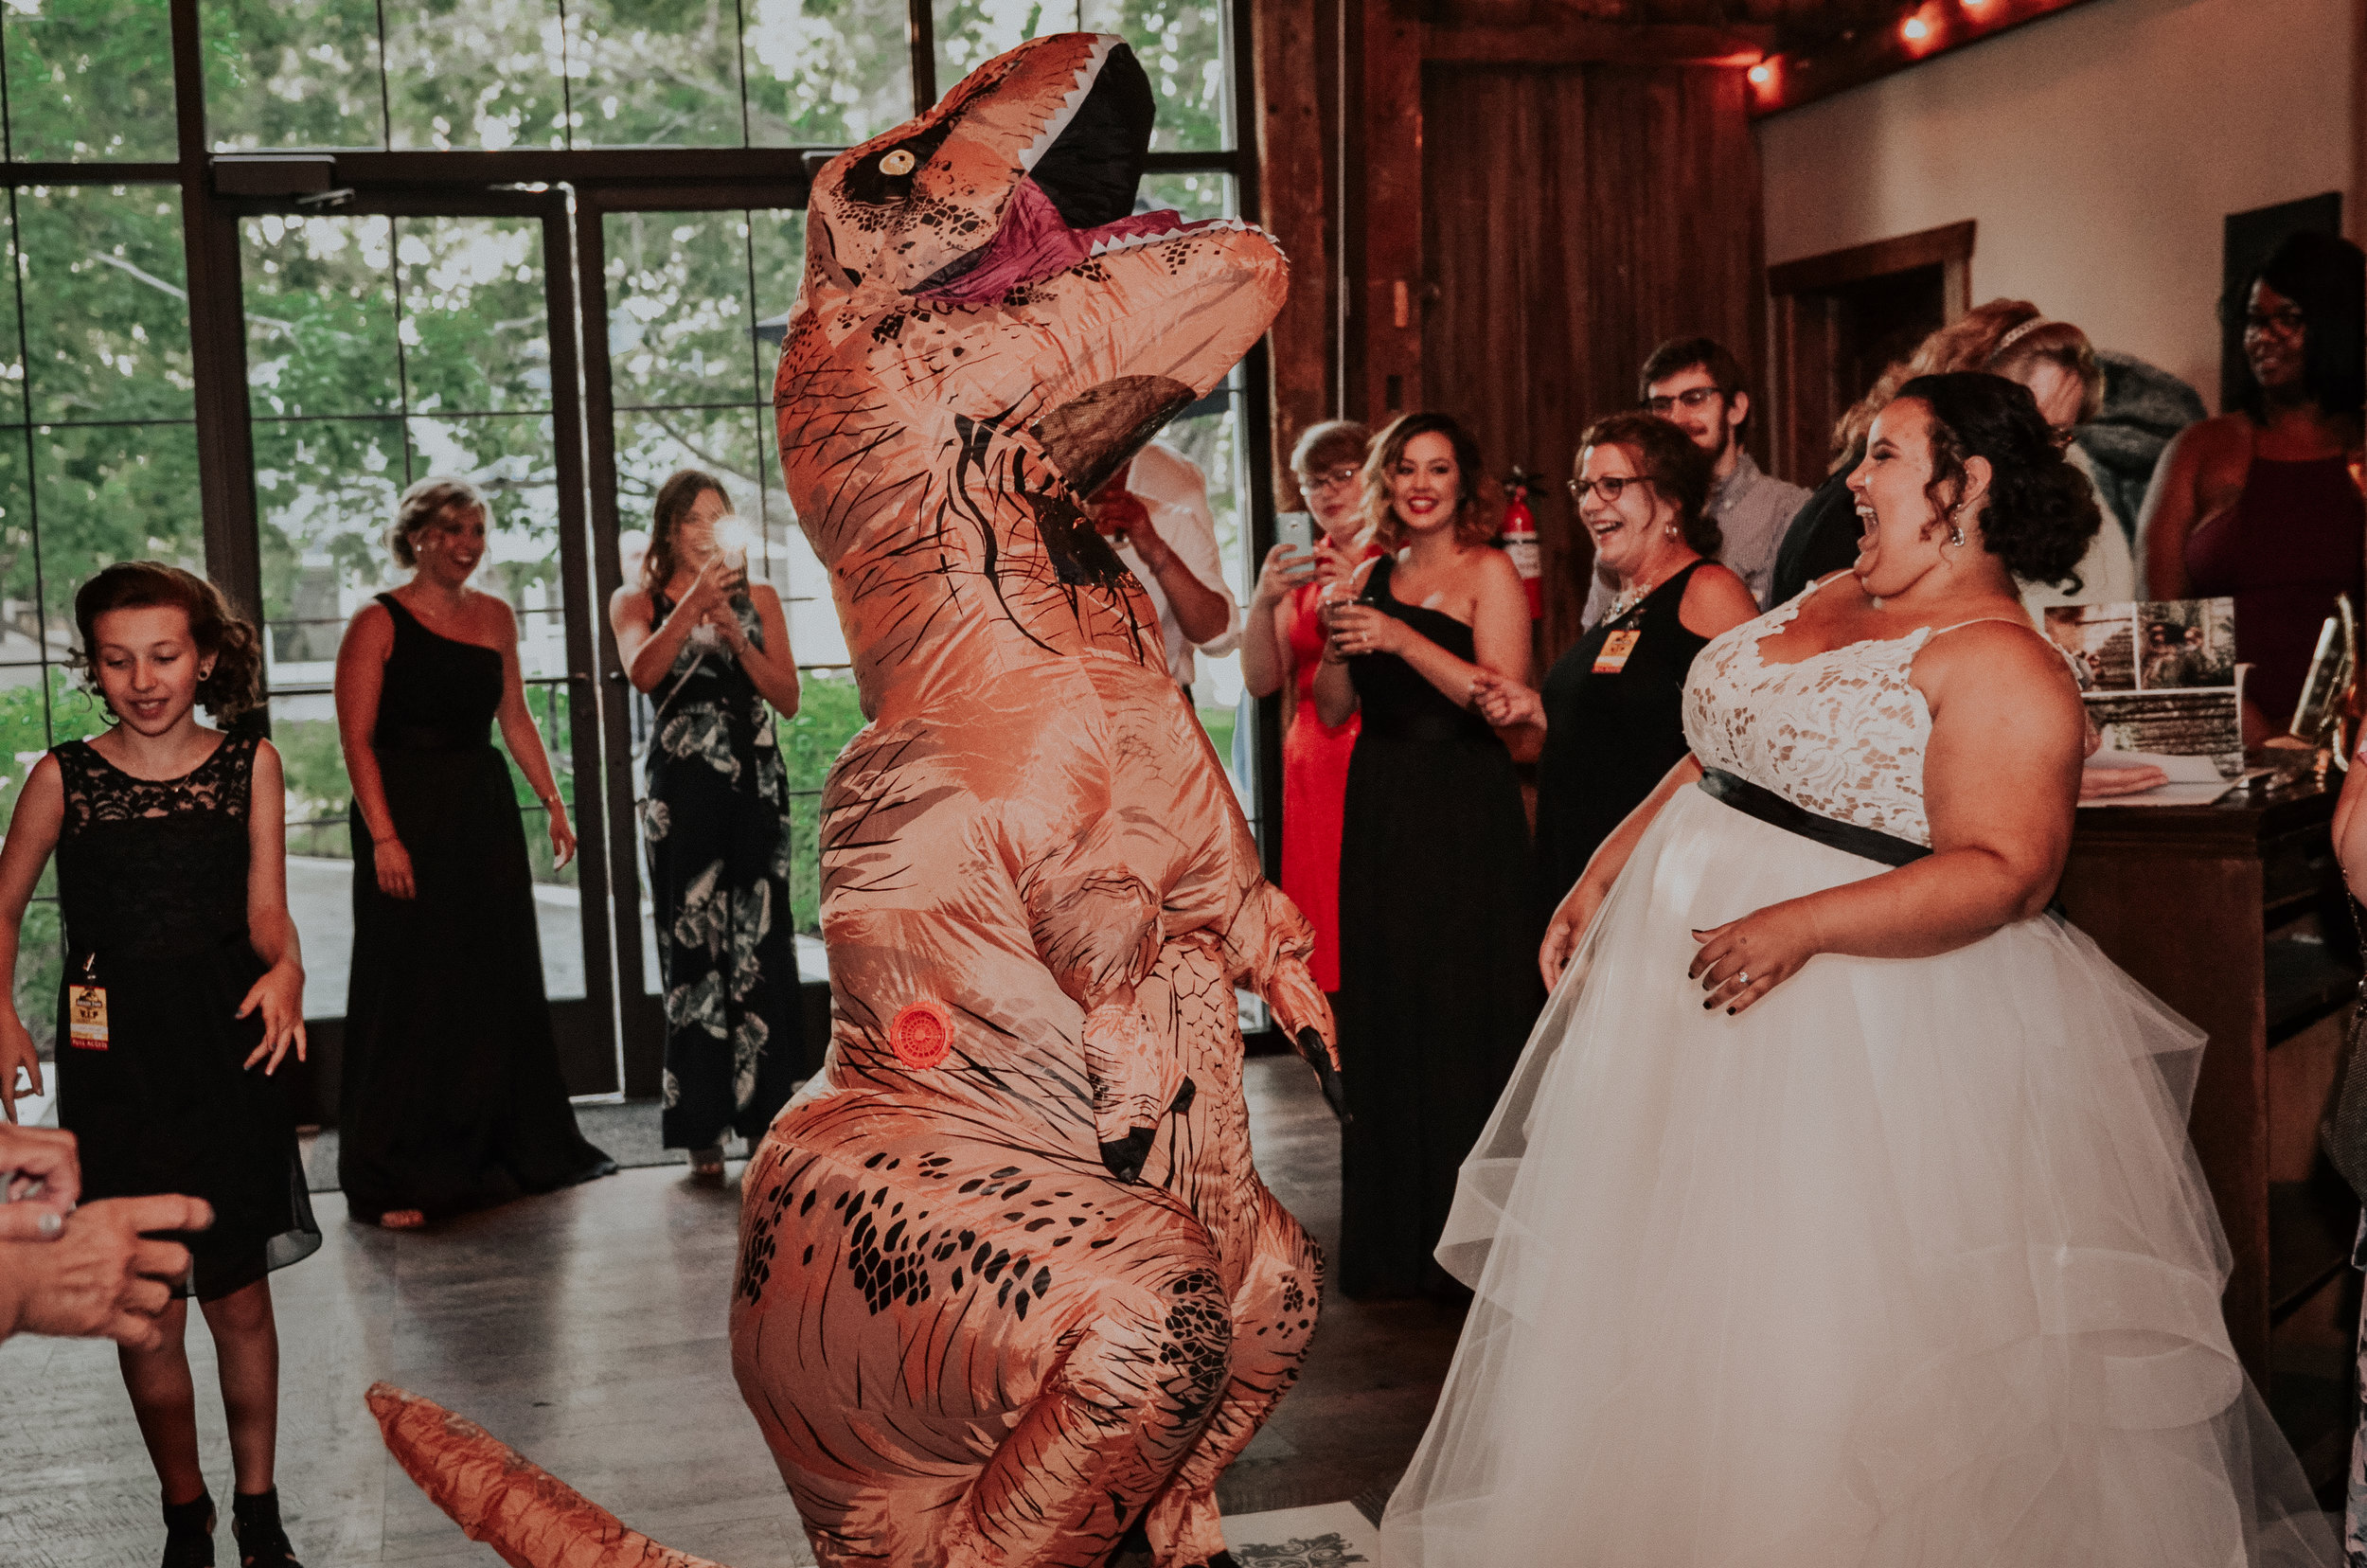 BridesbyYoung-RealWedding-PlusSizeBridal-BillyCourtney-JurassicParkTheme-45.jpg